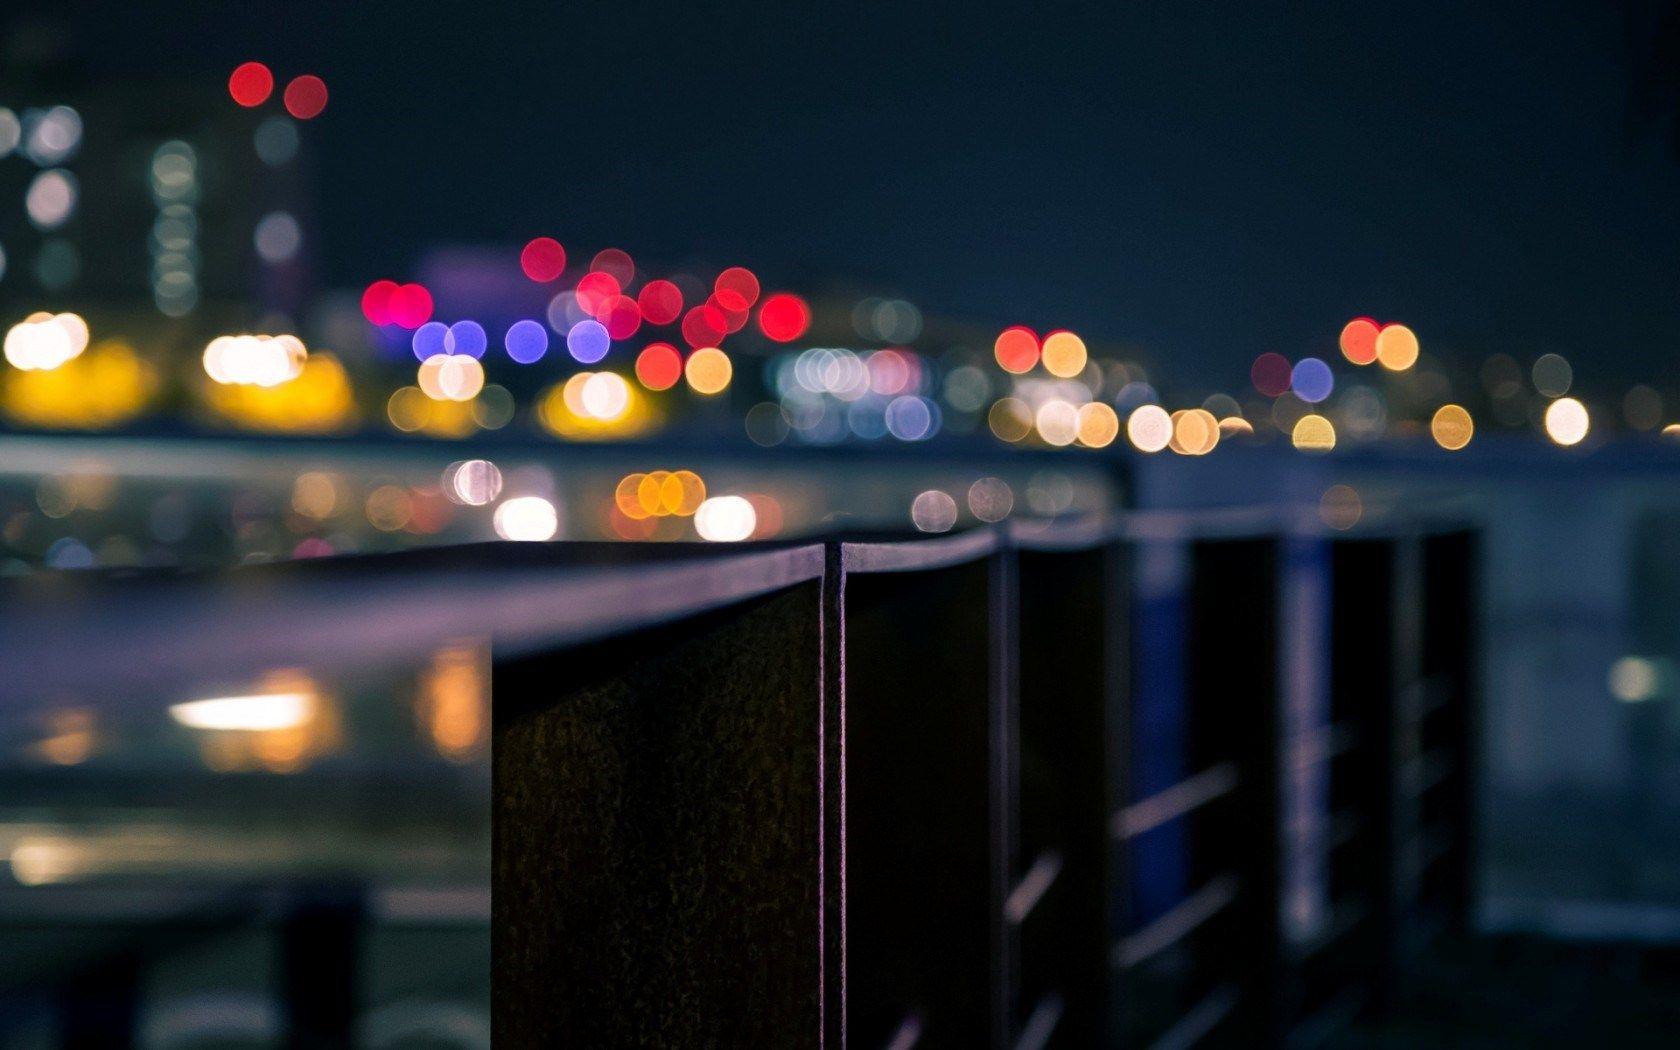 Macro City Lights Hd Wallpaper Freehdwalls City Wallpaper Wallpaper Pictures Pc Backgrounds Hd